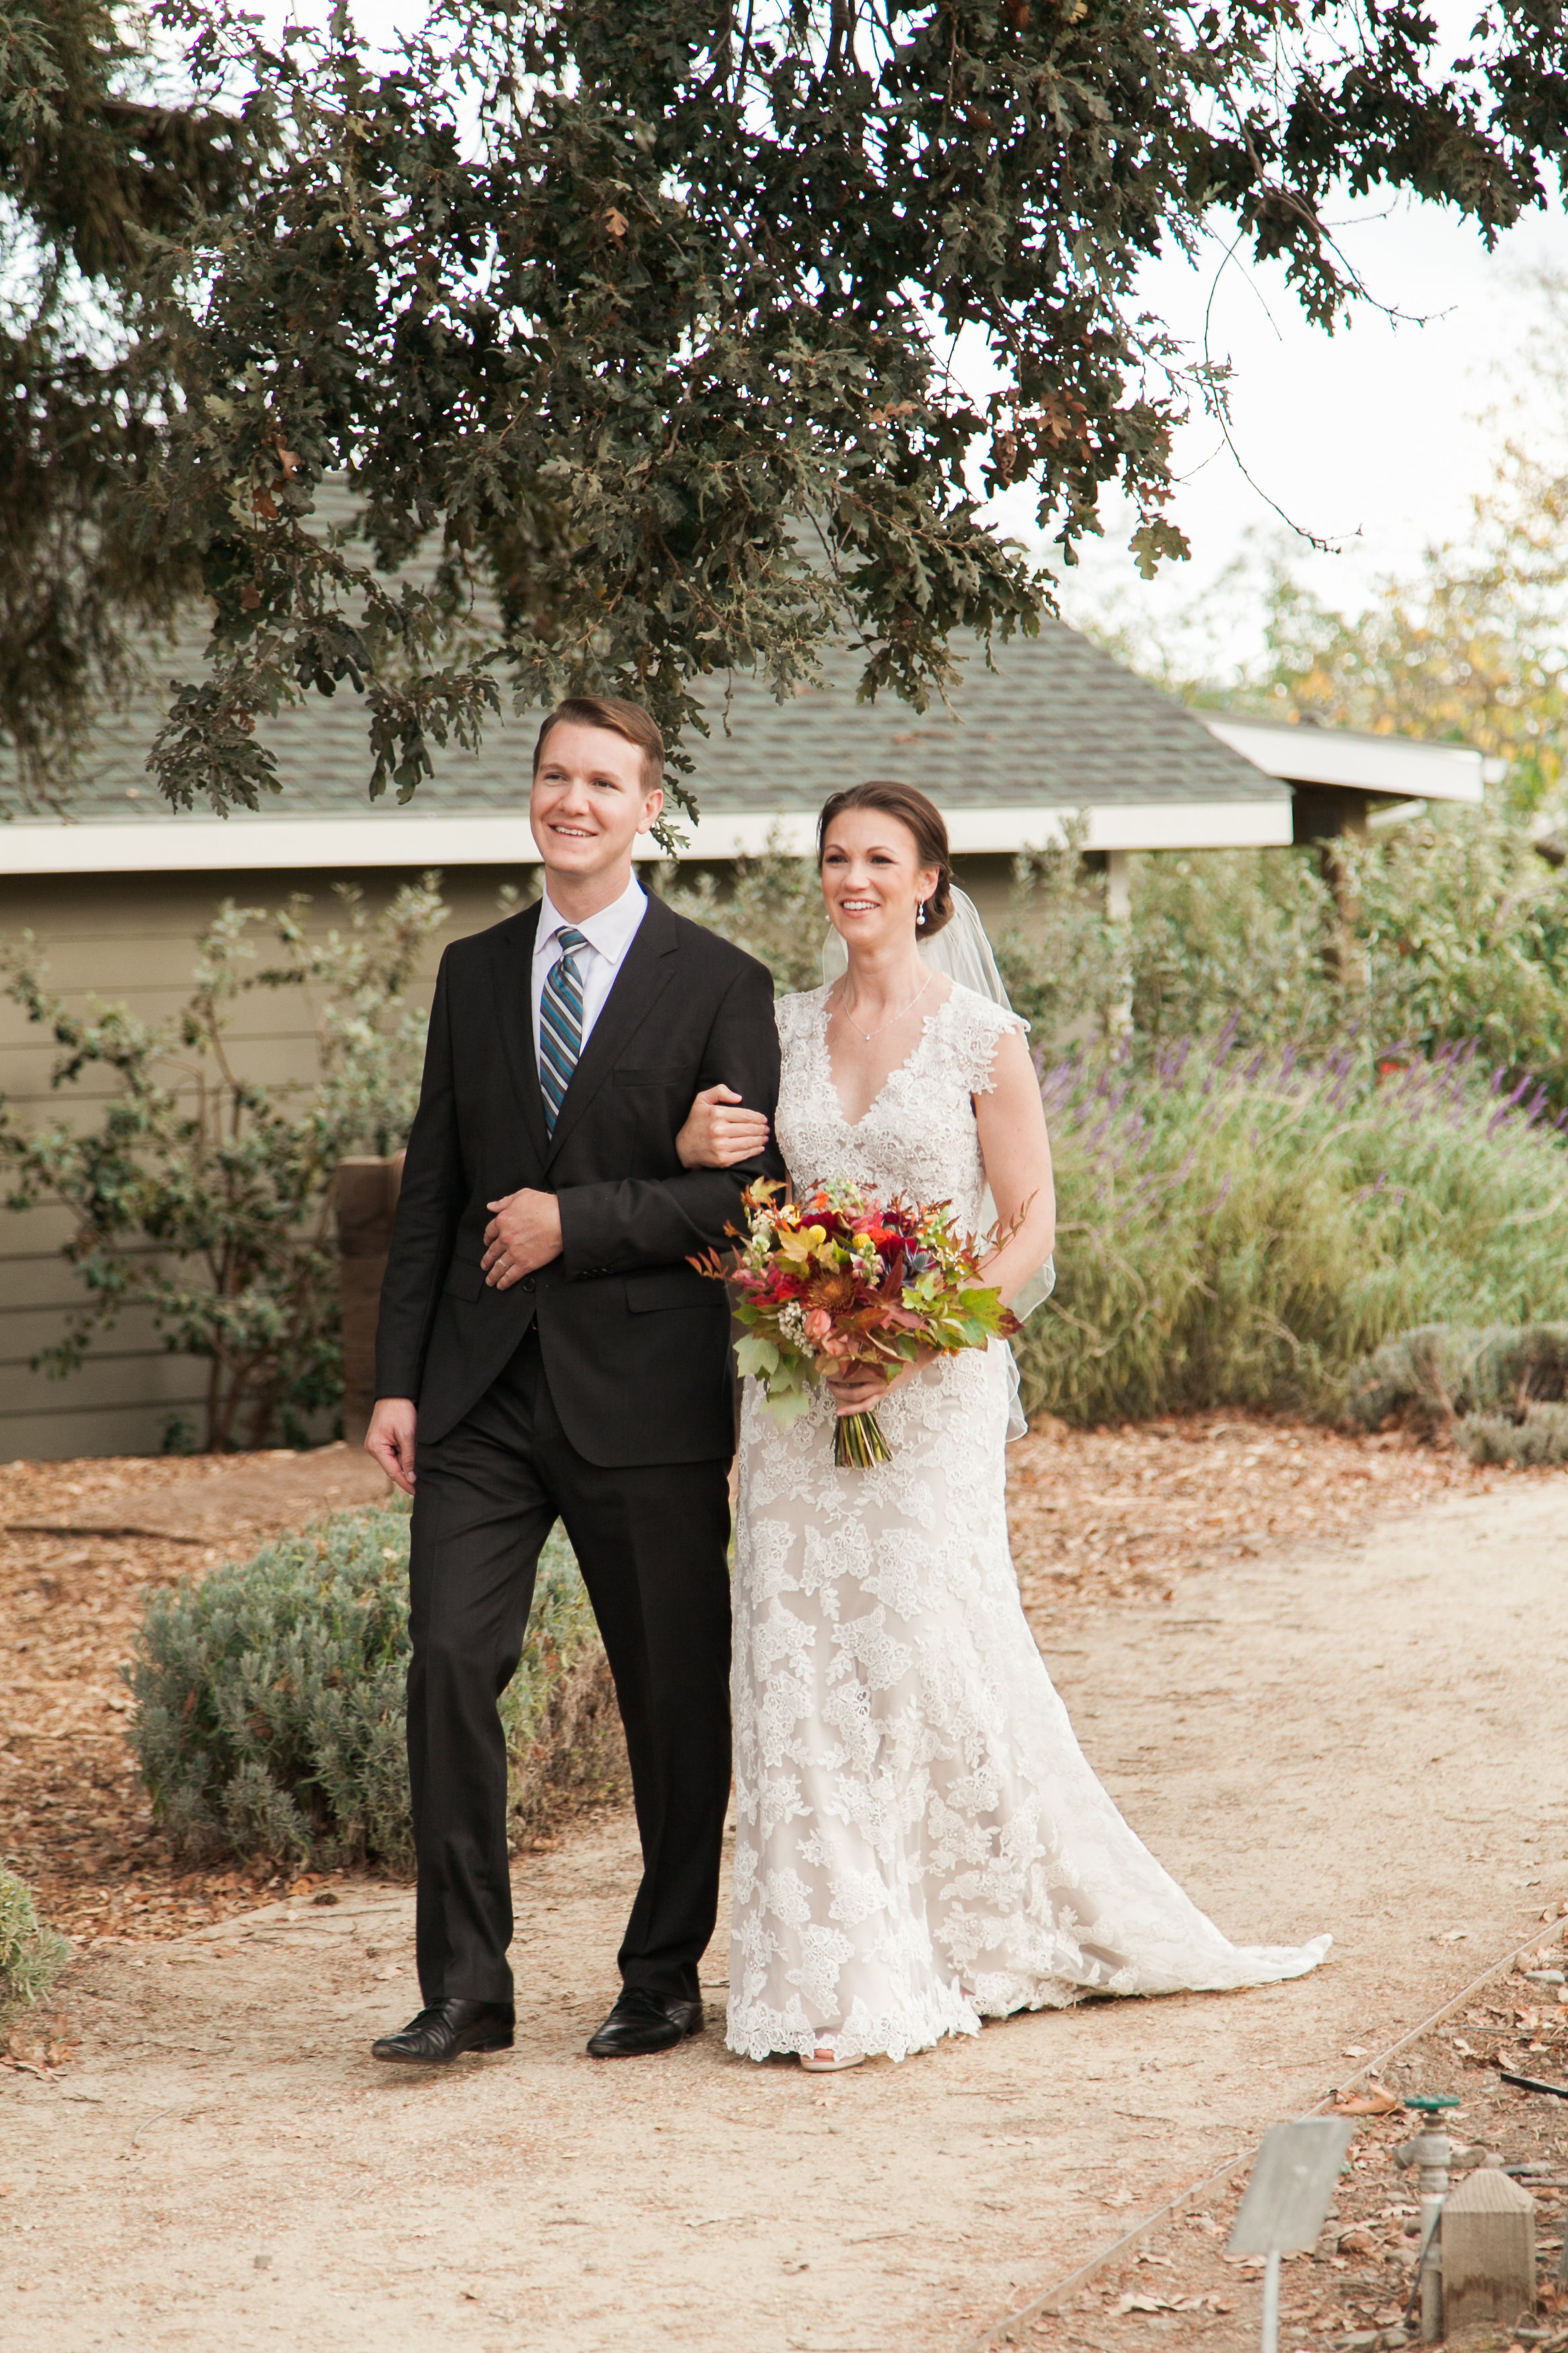 GetmarriedinYountville-weddingphotographer-56.jpg